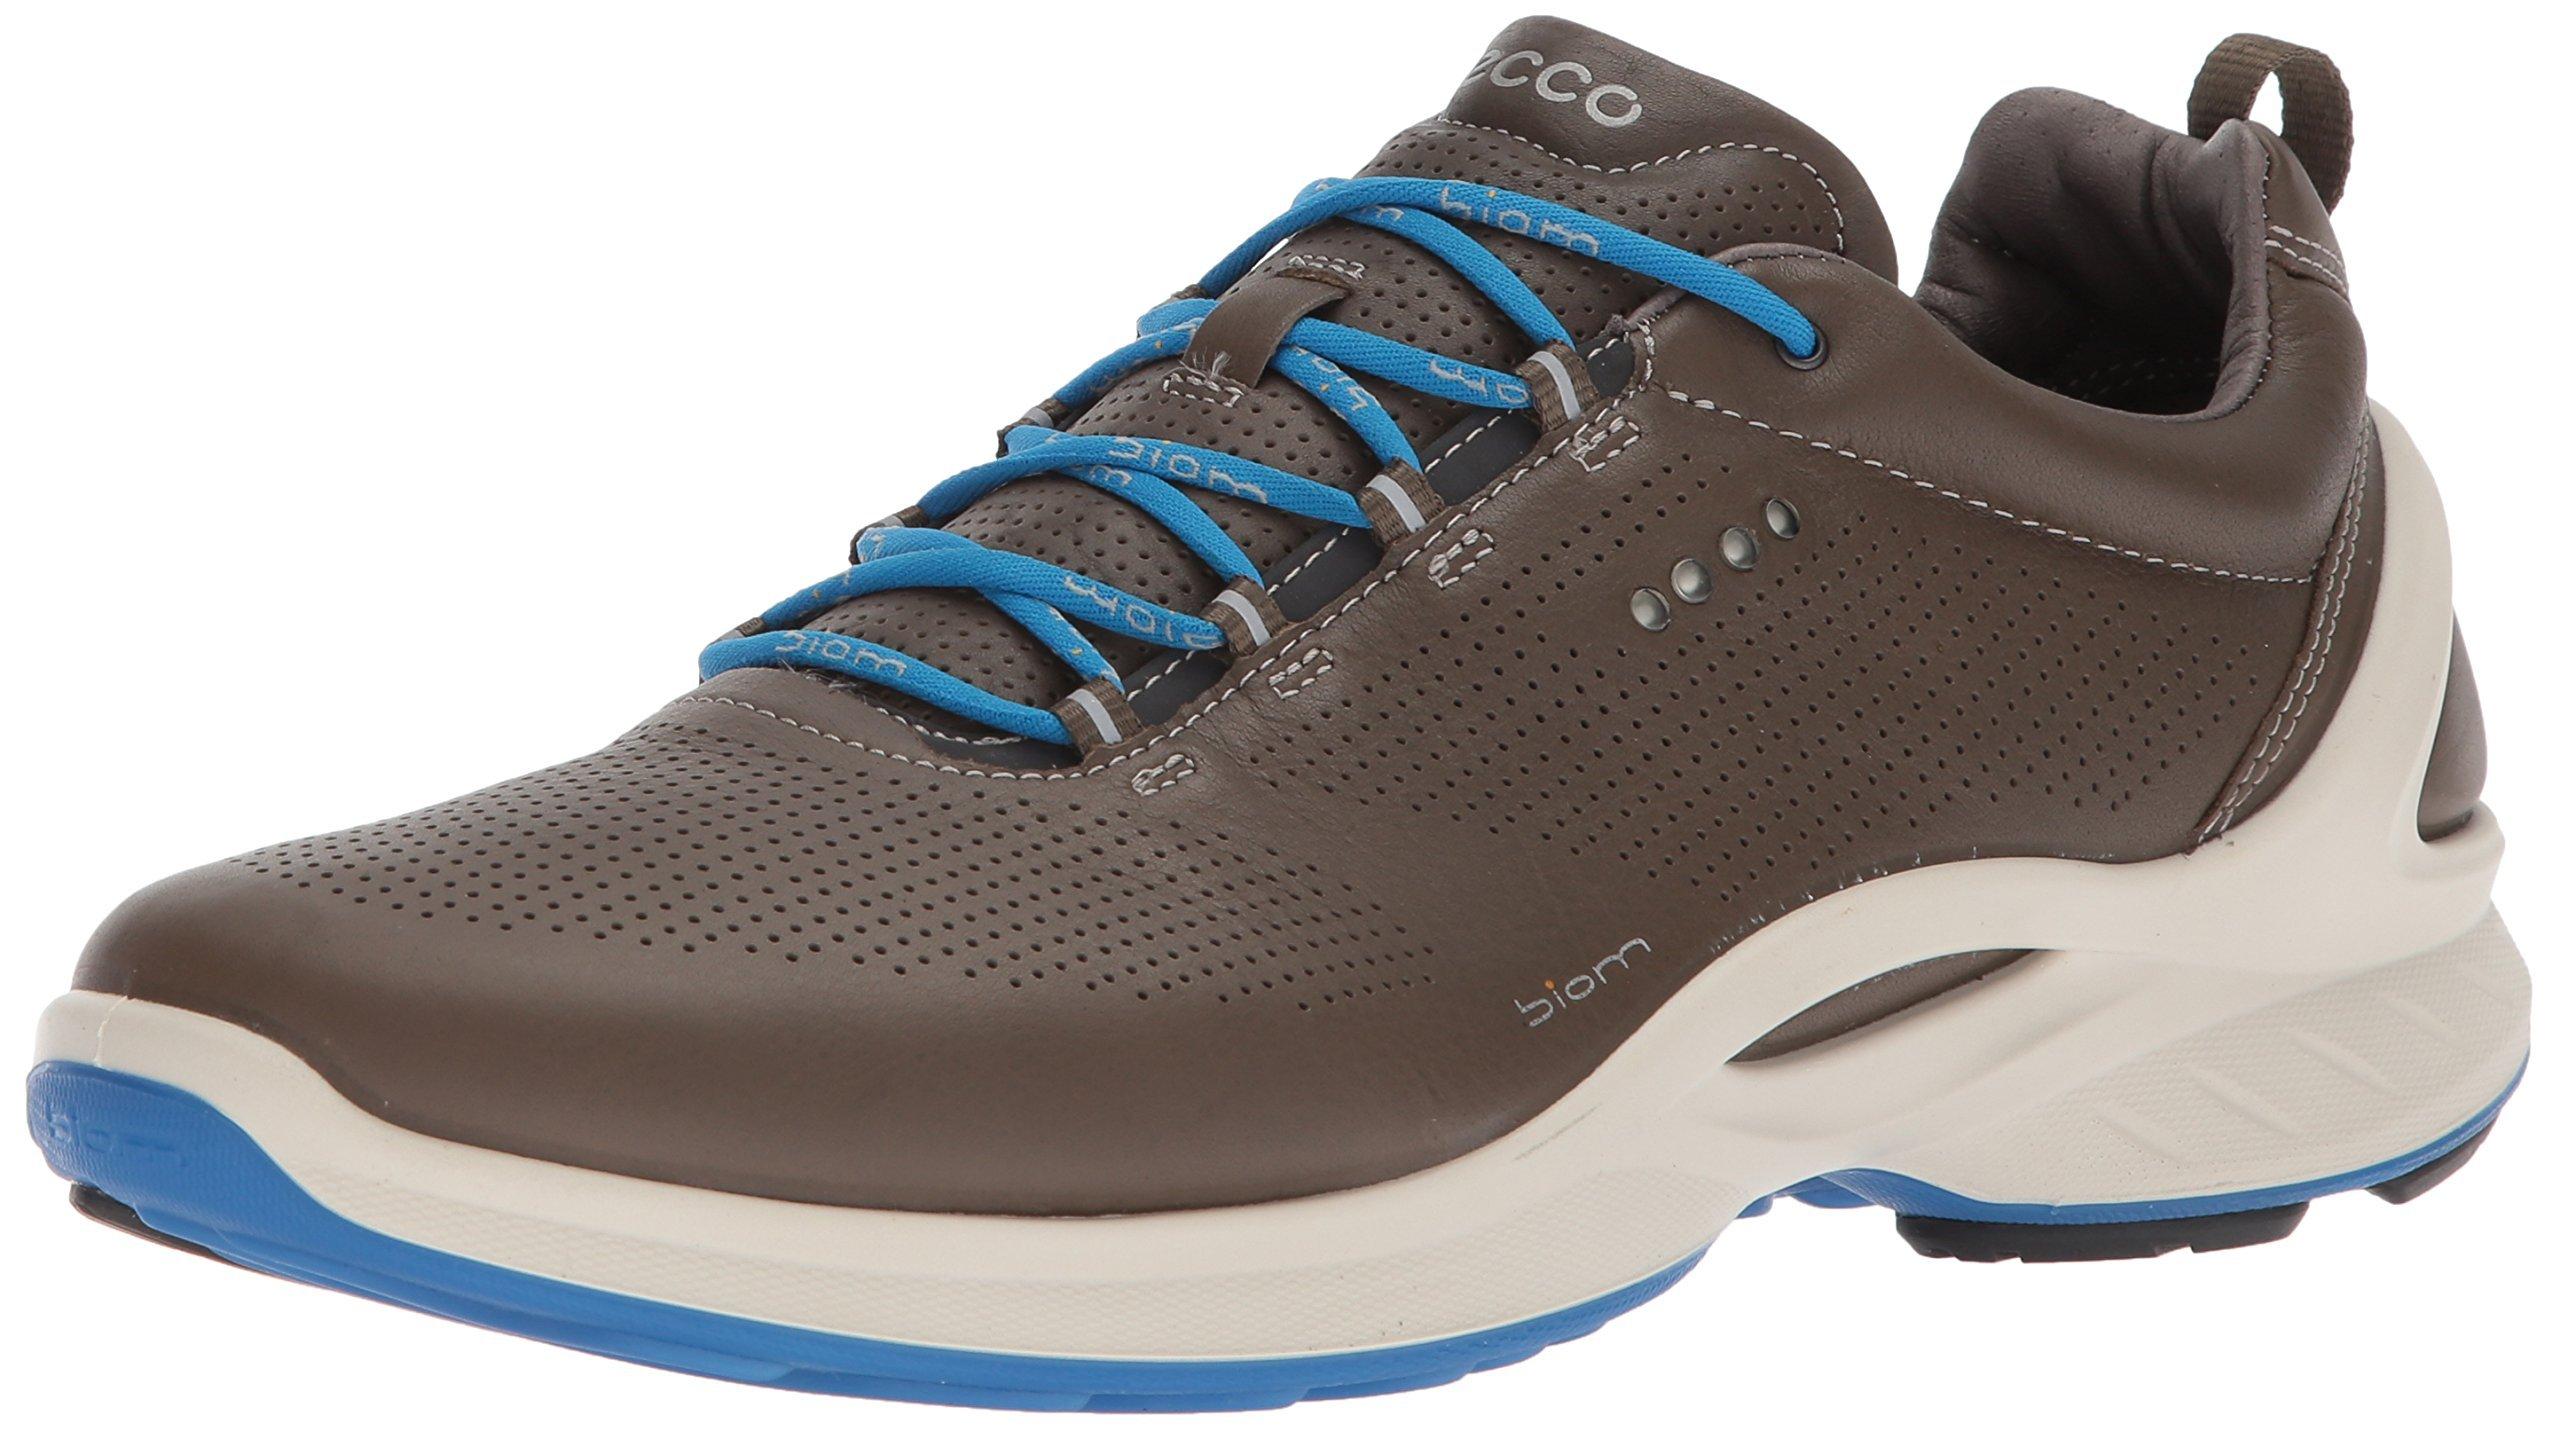 ECCO Men's Biom Fjuel Train Walking Shoe, Tarmac 44 EU/10-10.5 M US